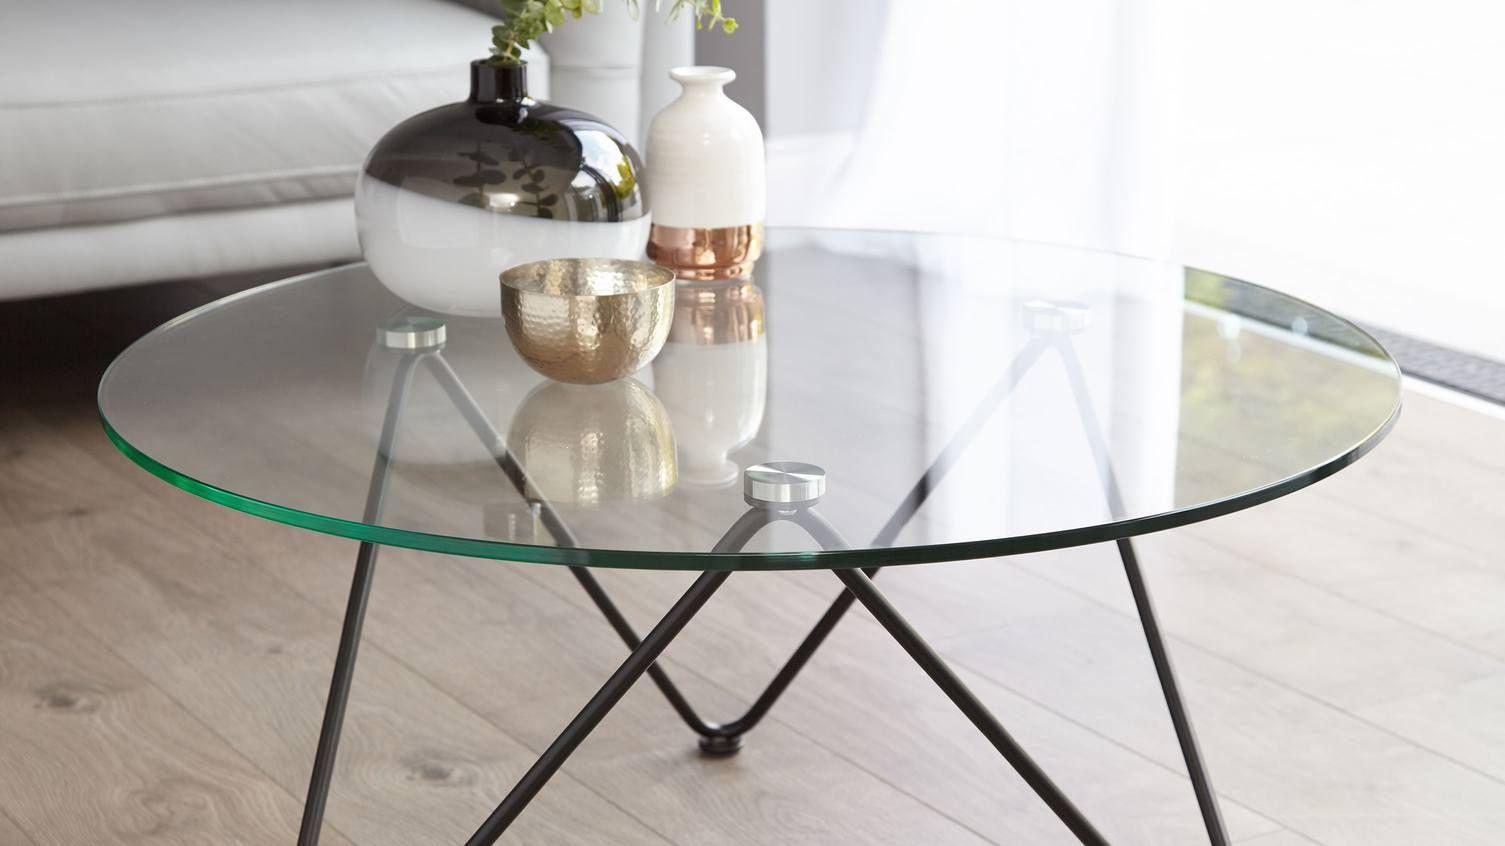 Cool Ripple Glass And Matt Black Coffee Table Coffee Table In Download Free Architecture Designs Intelgarnamadebymaigaardcom